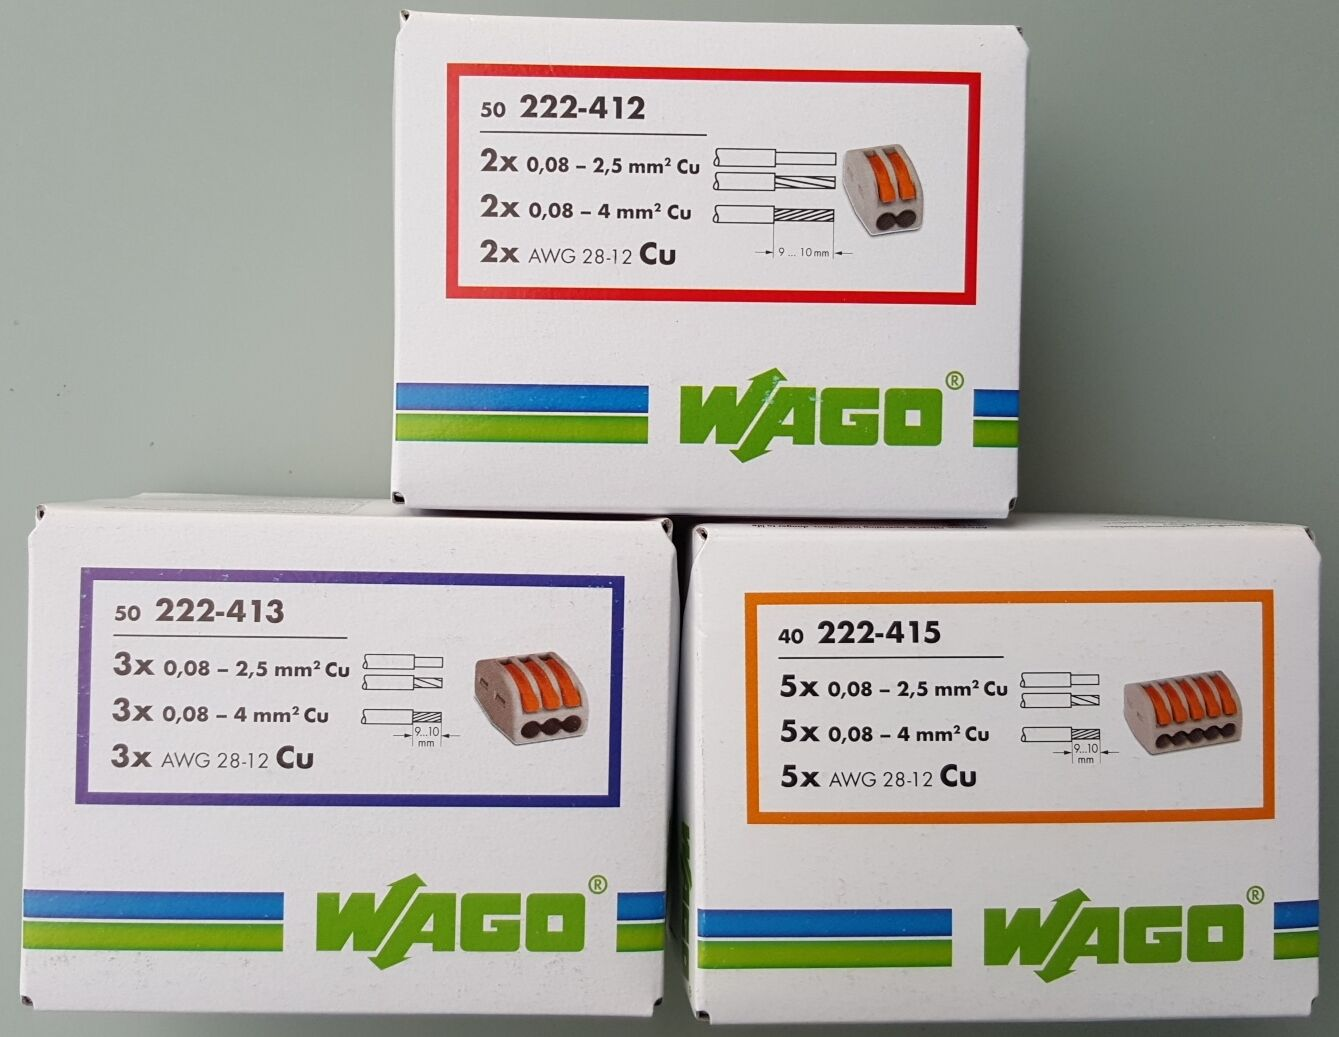 Wagoklemmen SET 50x222-412, 50x222-413, 40x 222-415,  Original WAGO Klemmen